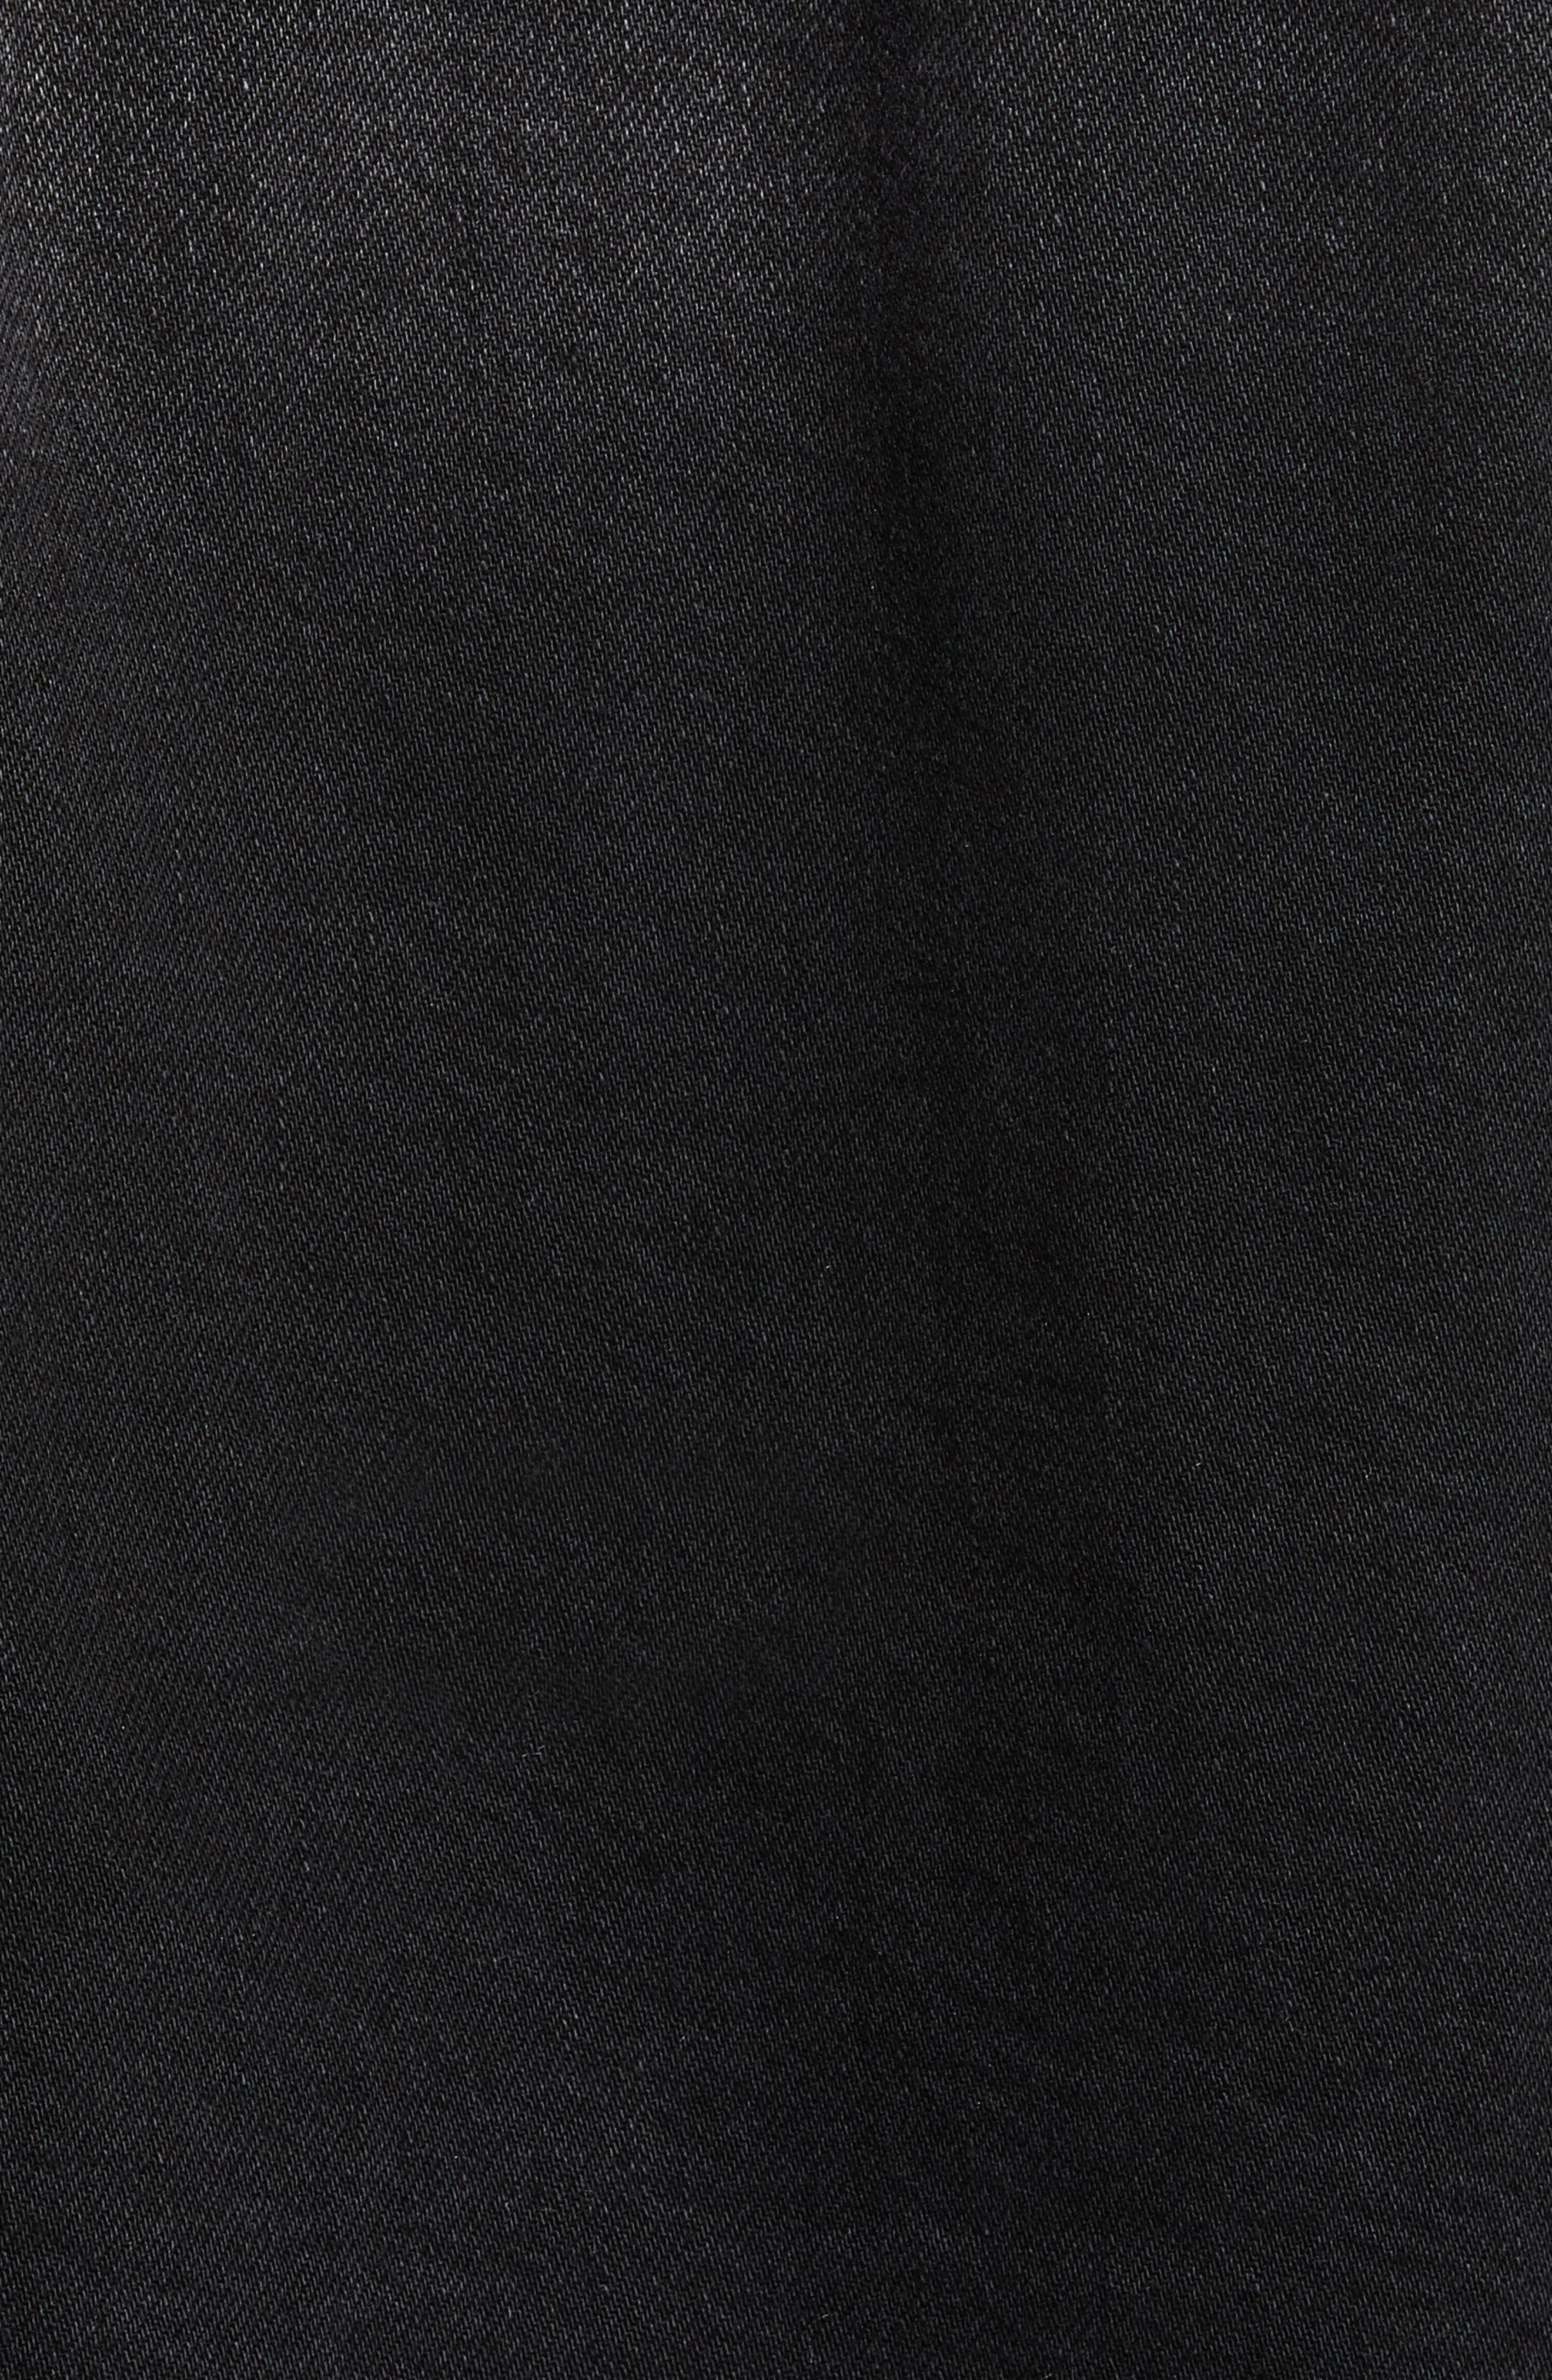 Annie Crop Denim Jacket,                             Alternate thumbnail 7, color,                             BLACKBURN